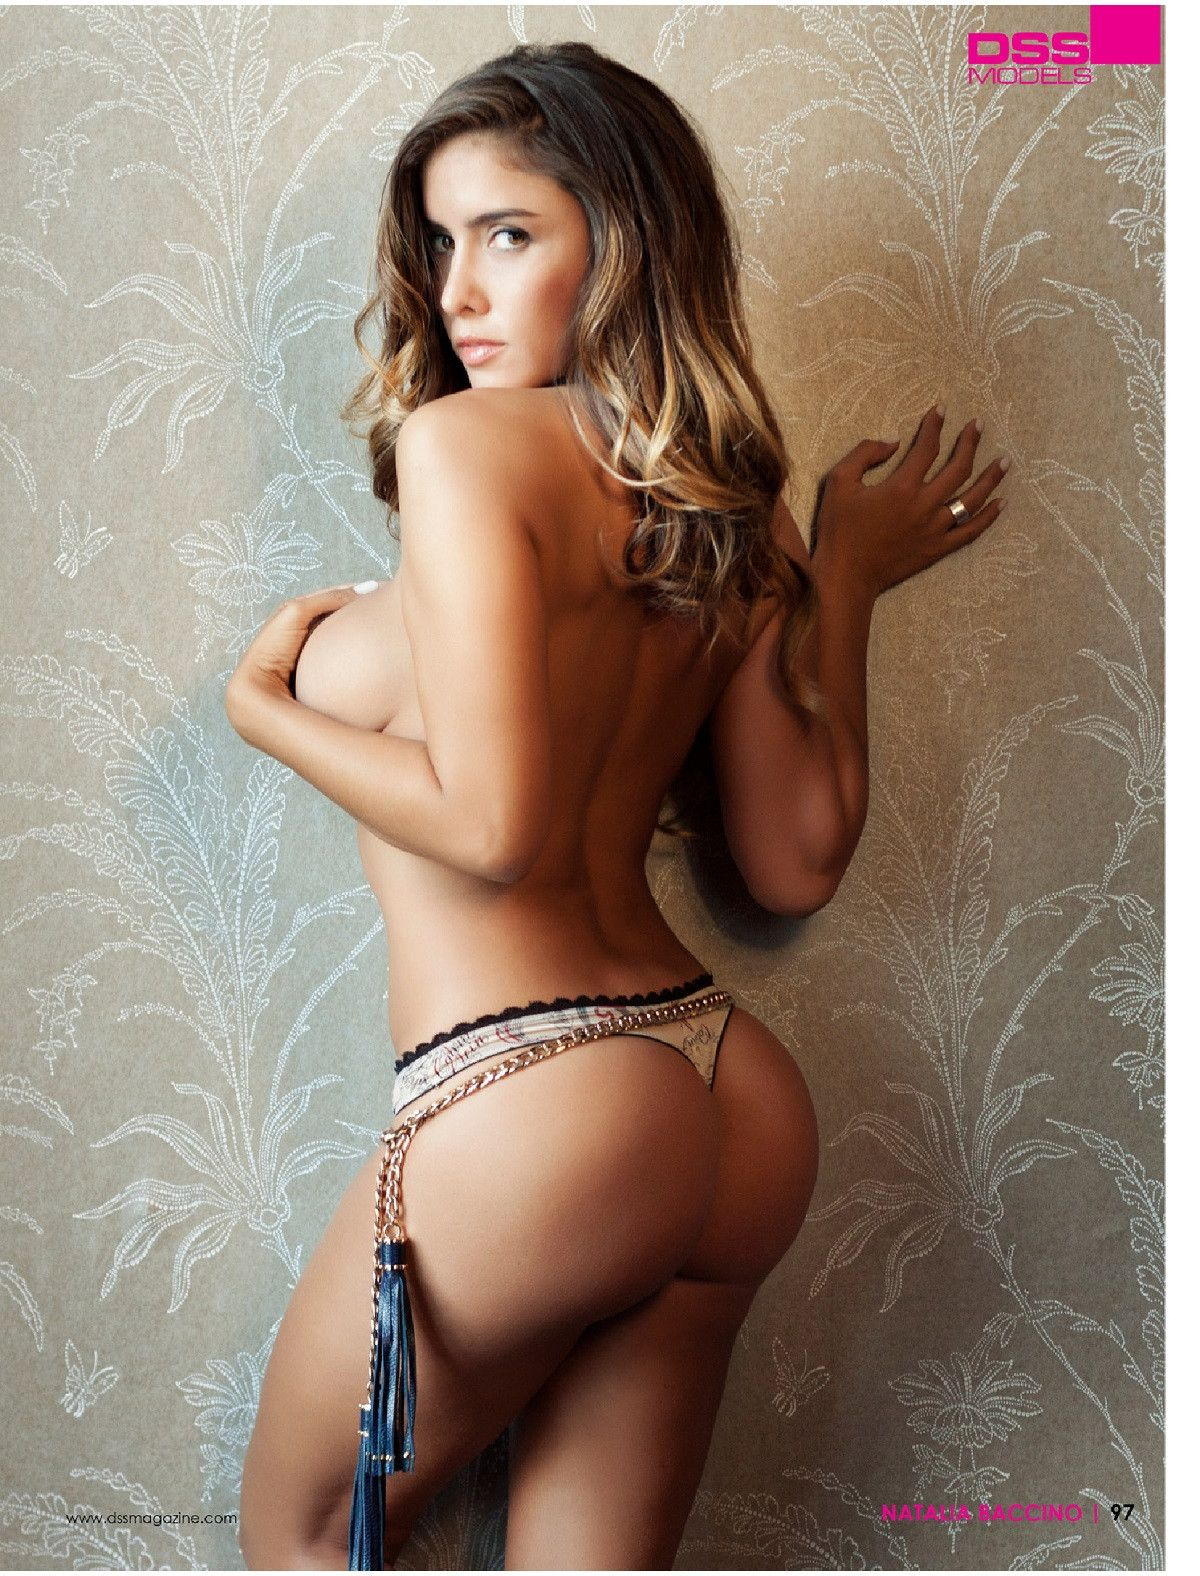 Sara jay hot boobs